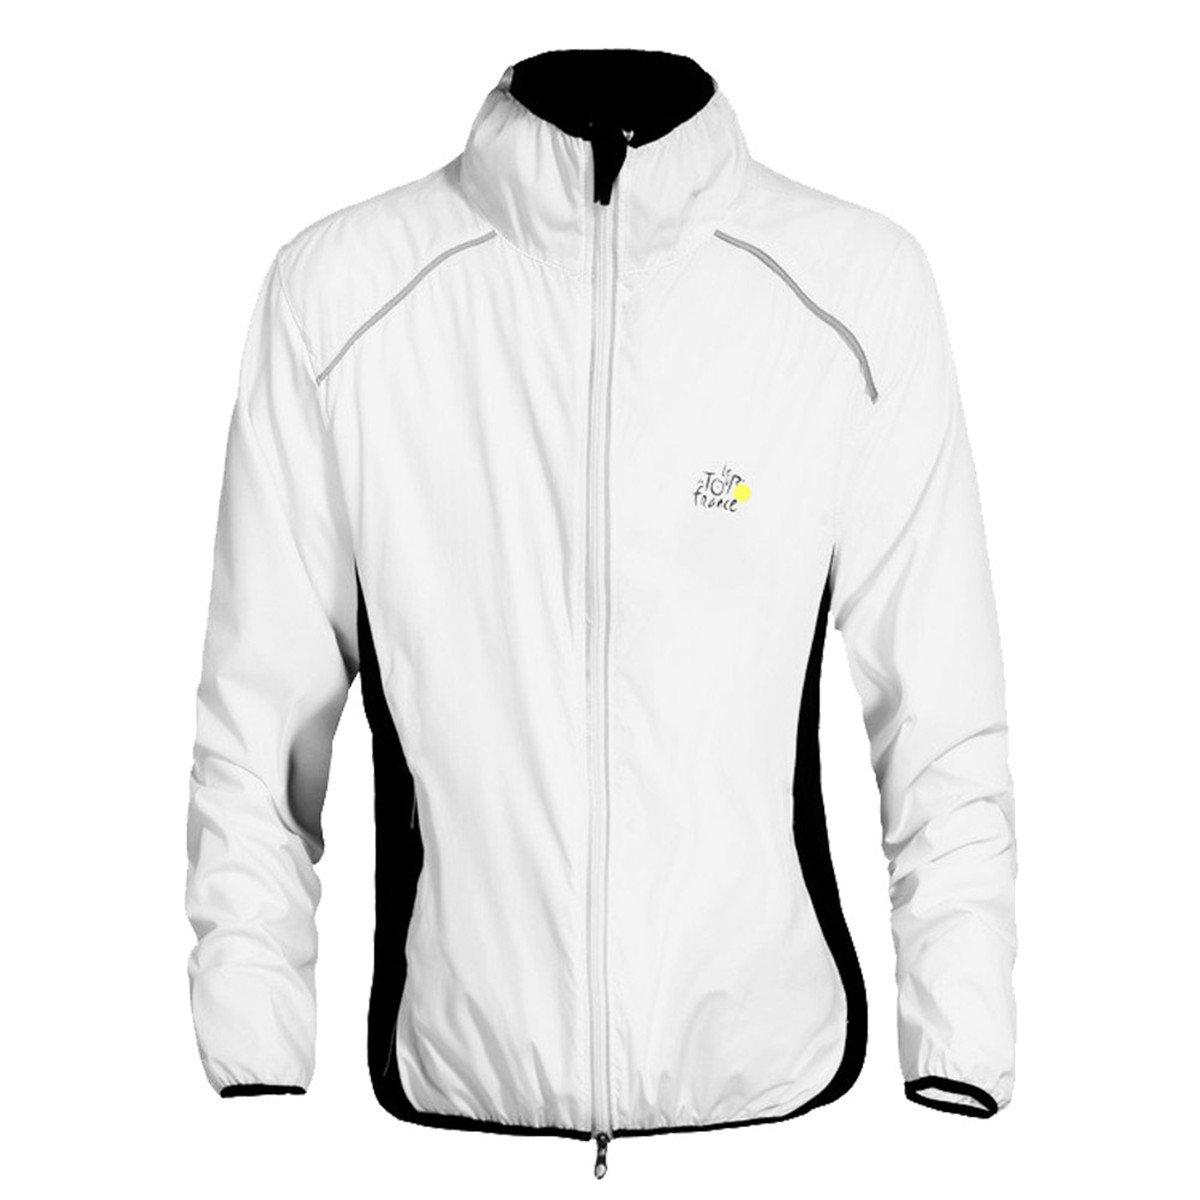 Apparelsales Unisex Wind Coat Cycling Jacket Windbreaker Outdoor Skinsuits Lindaeshop